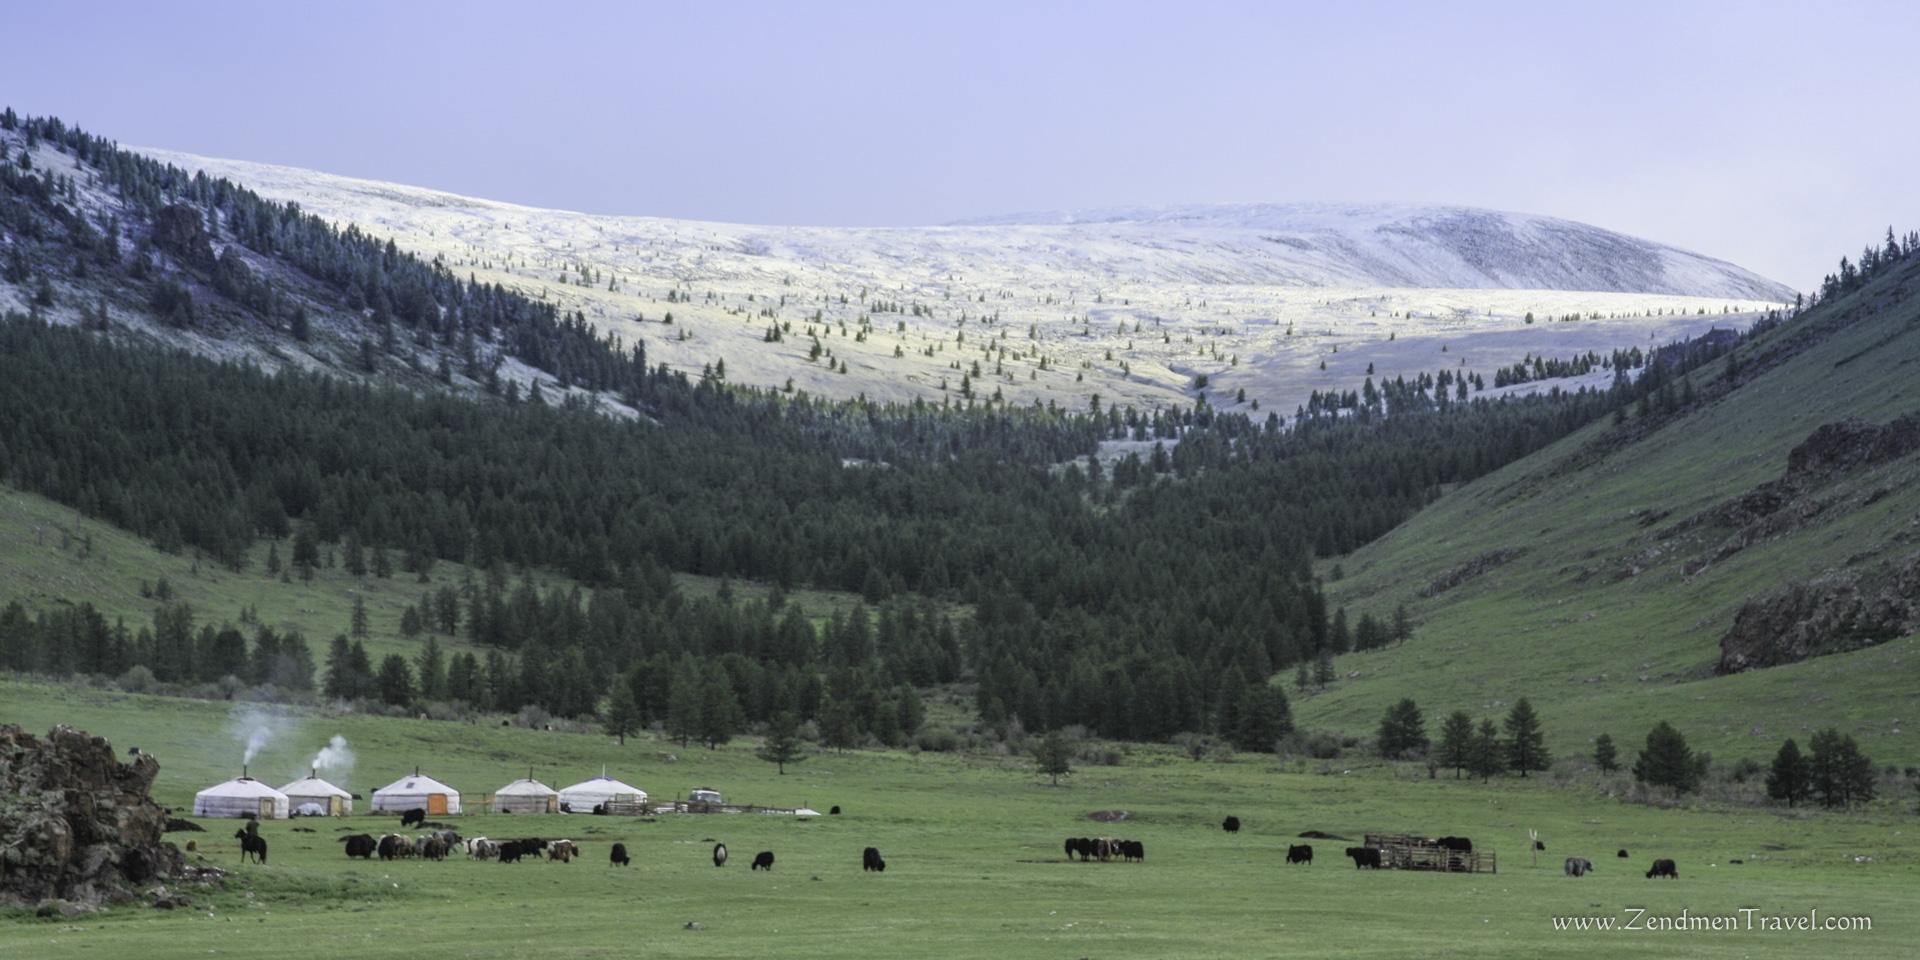 Snows in the mountains of Khangai mountains